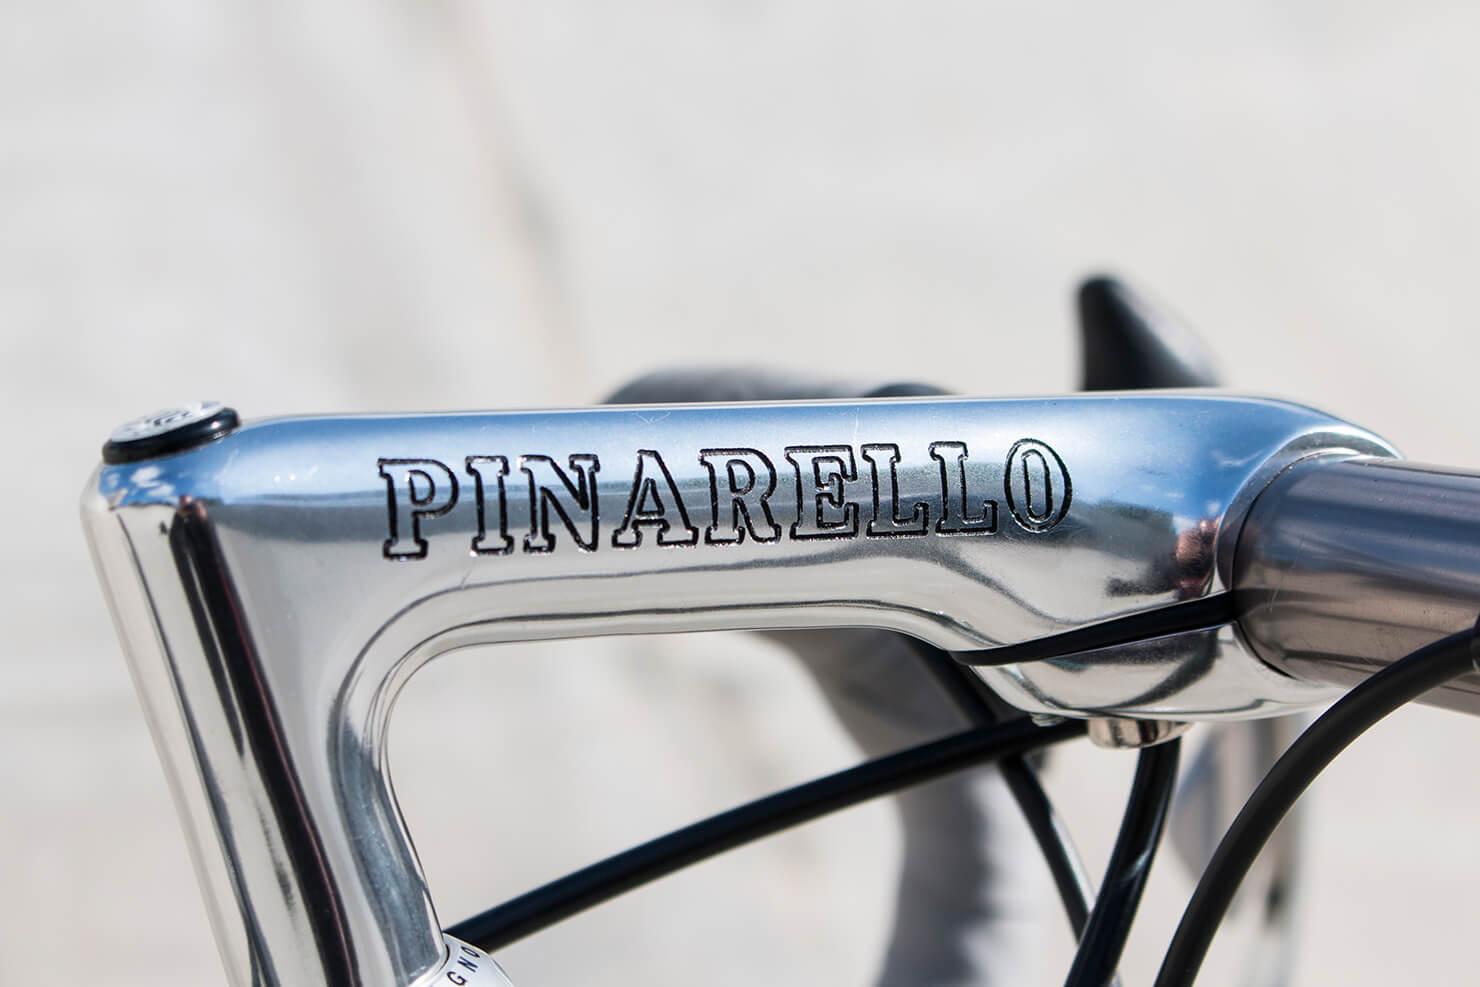 Pinarello-Montello-006